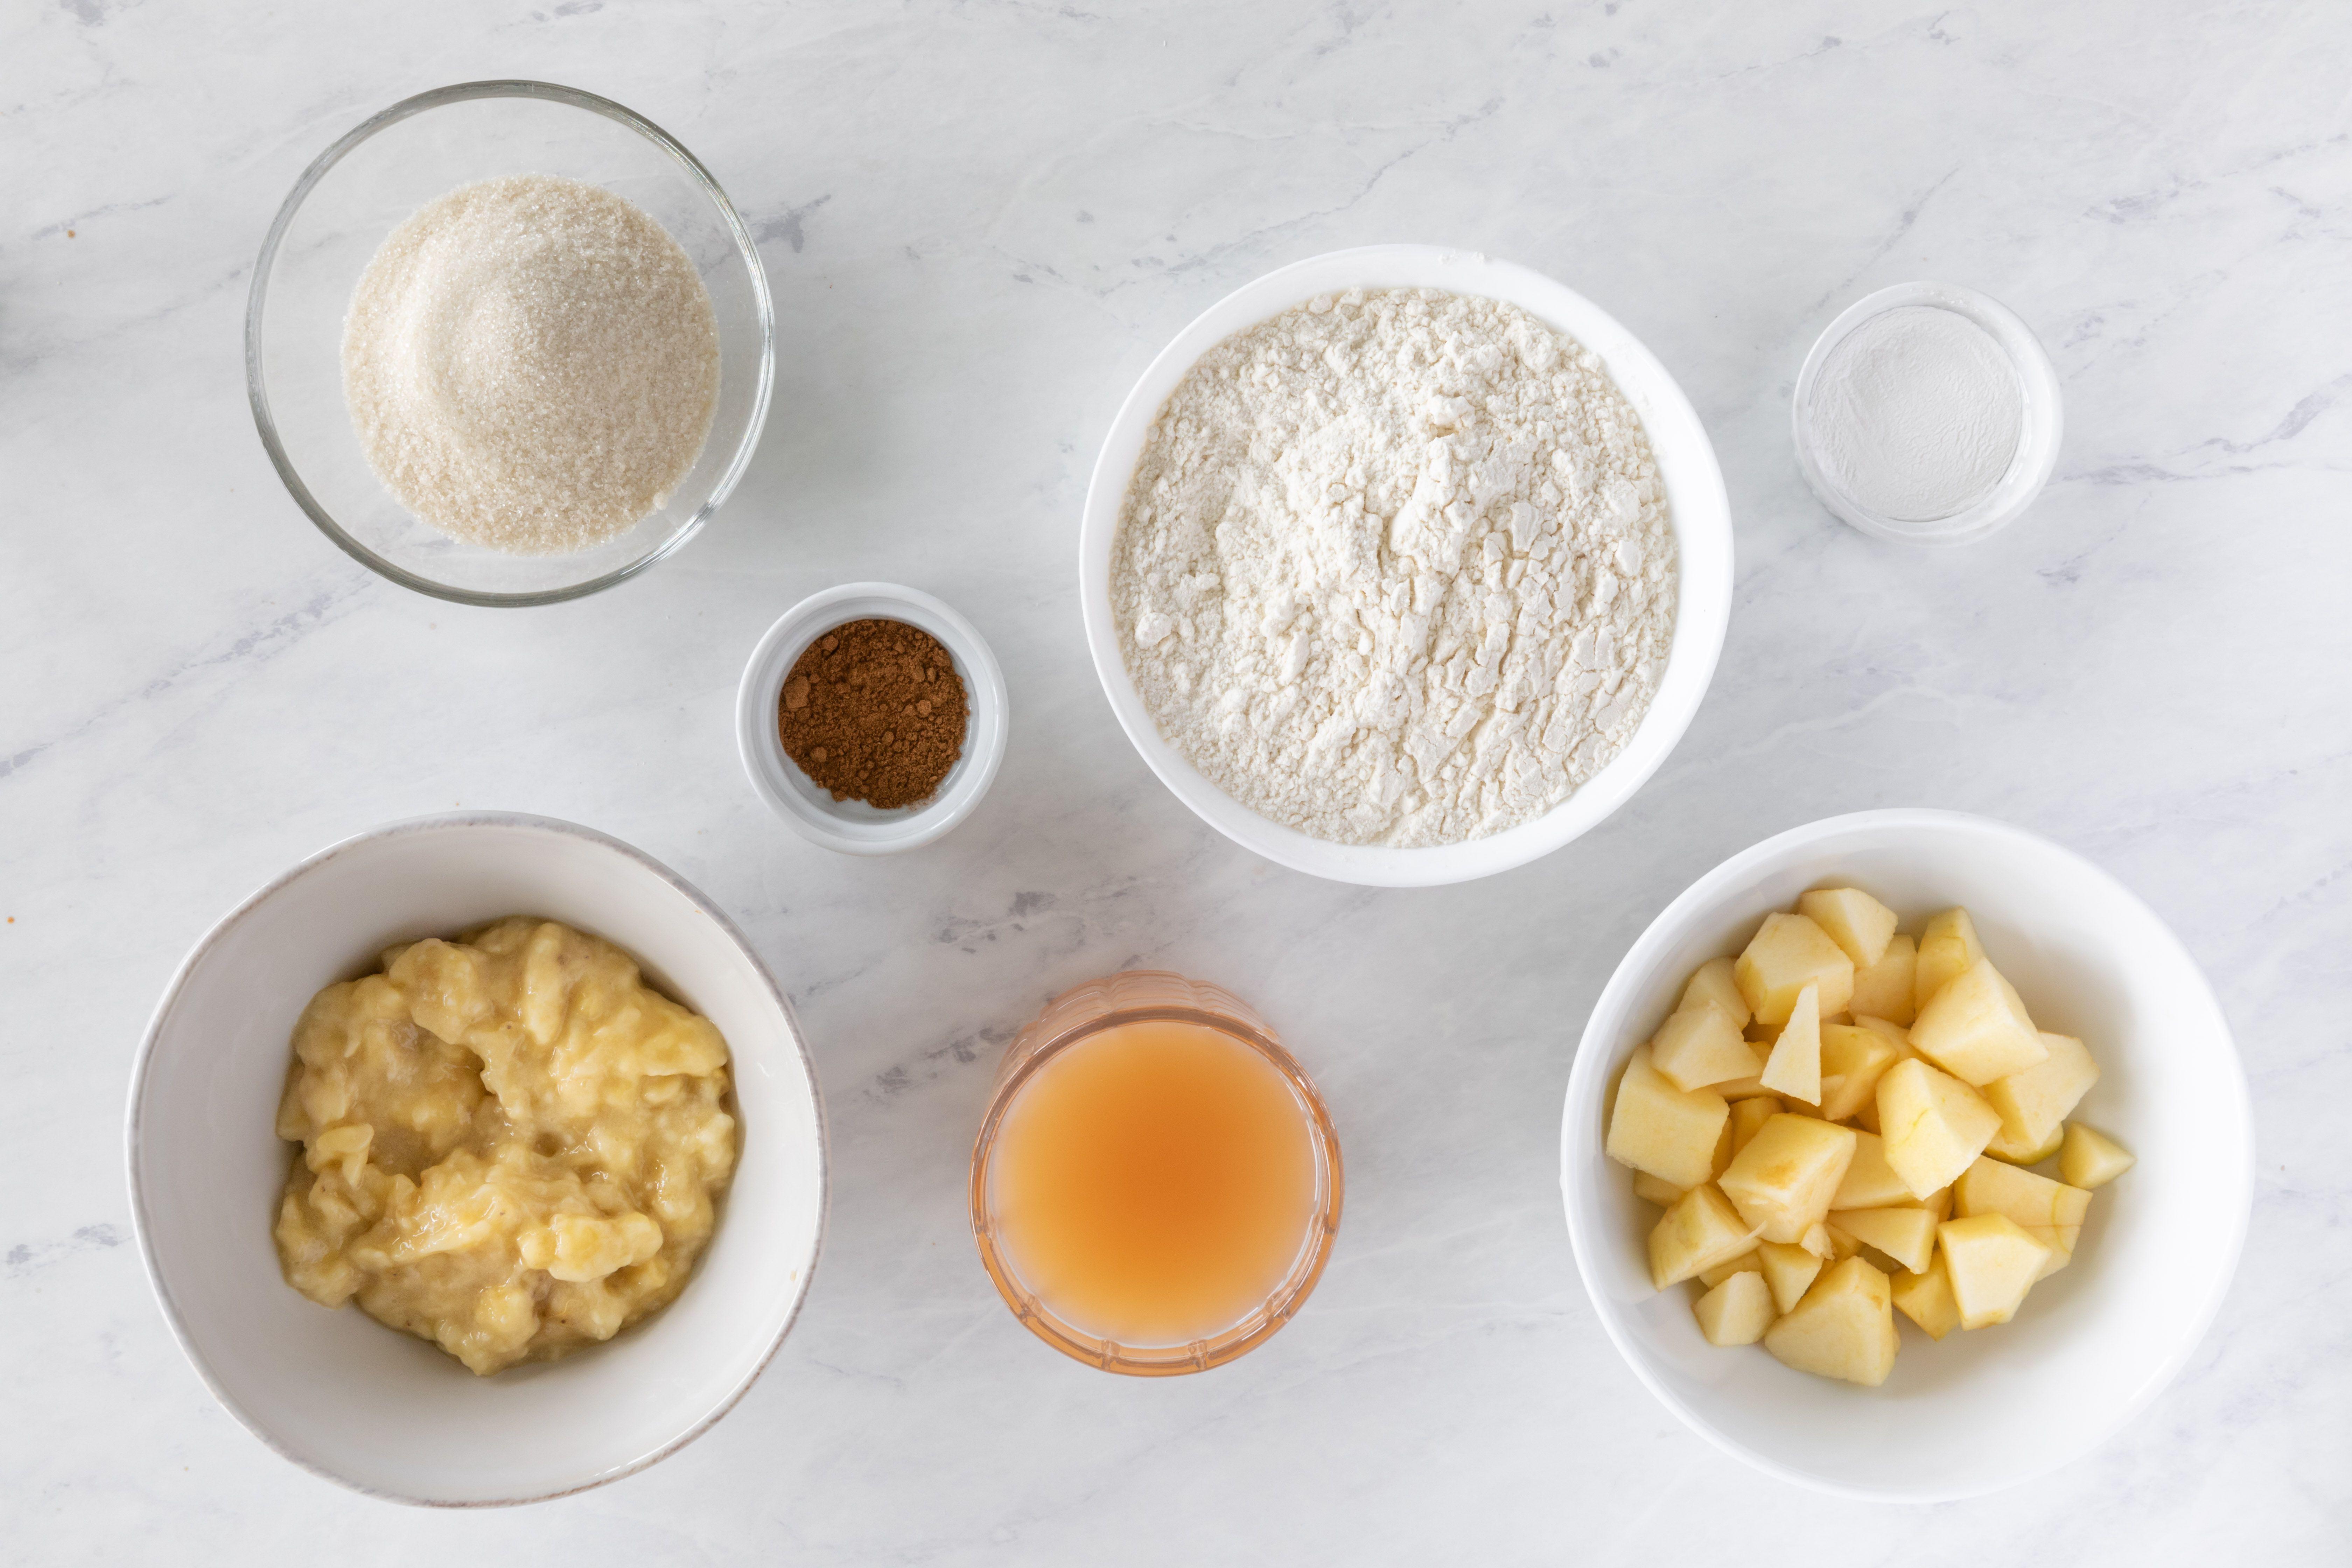 Ingredients for vegan apple banana muffins